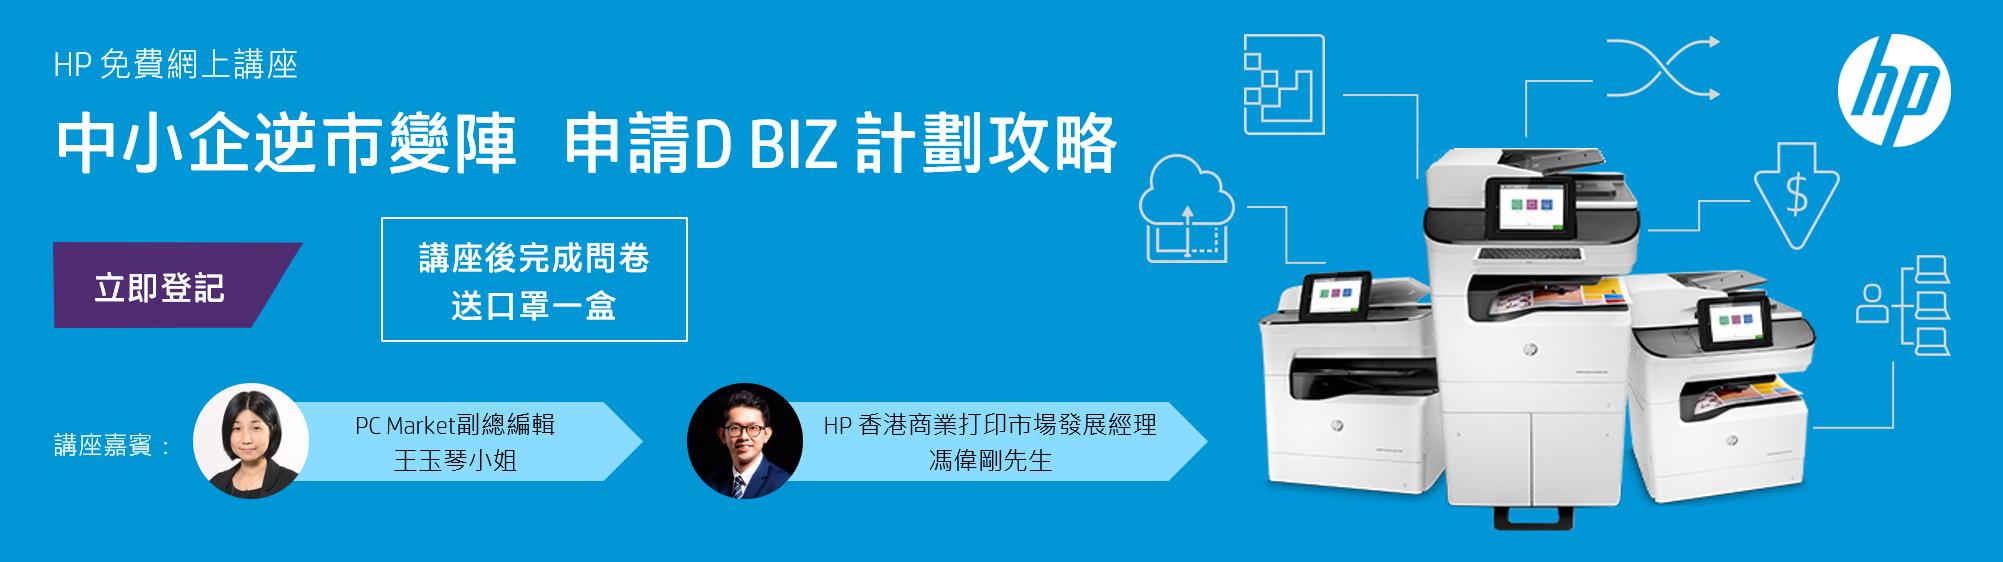 HP 免費網上講座 – 中小企逆市變陣, 申請 D-BIZ 計劃攻略